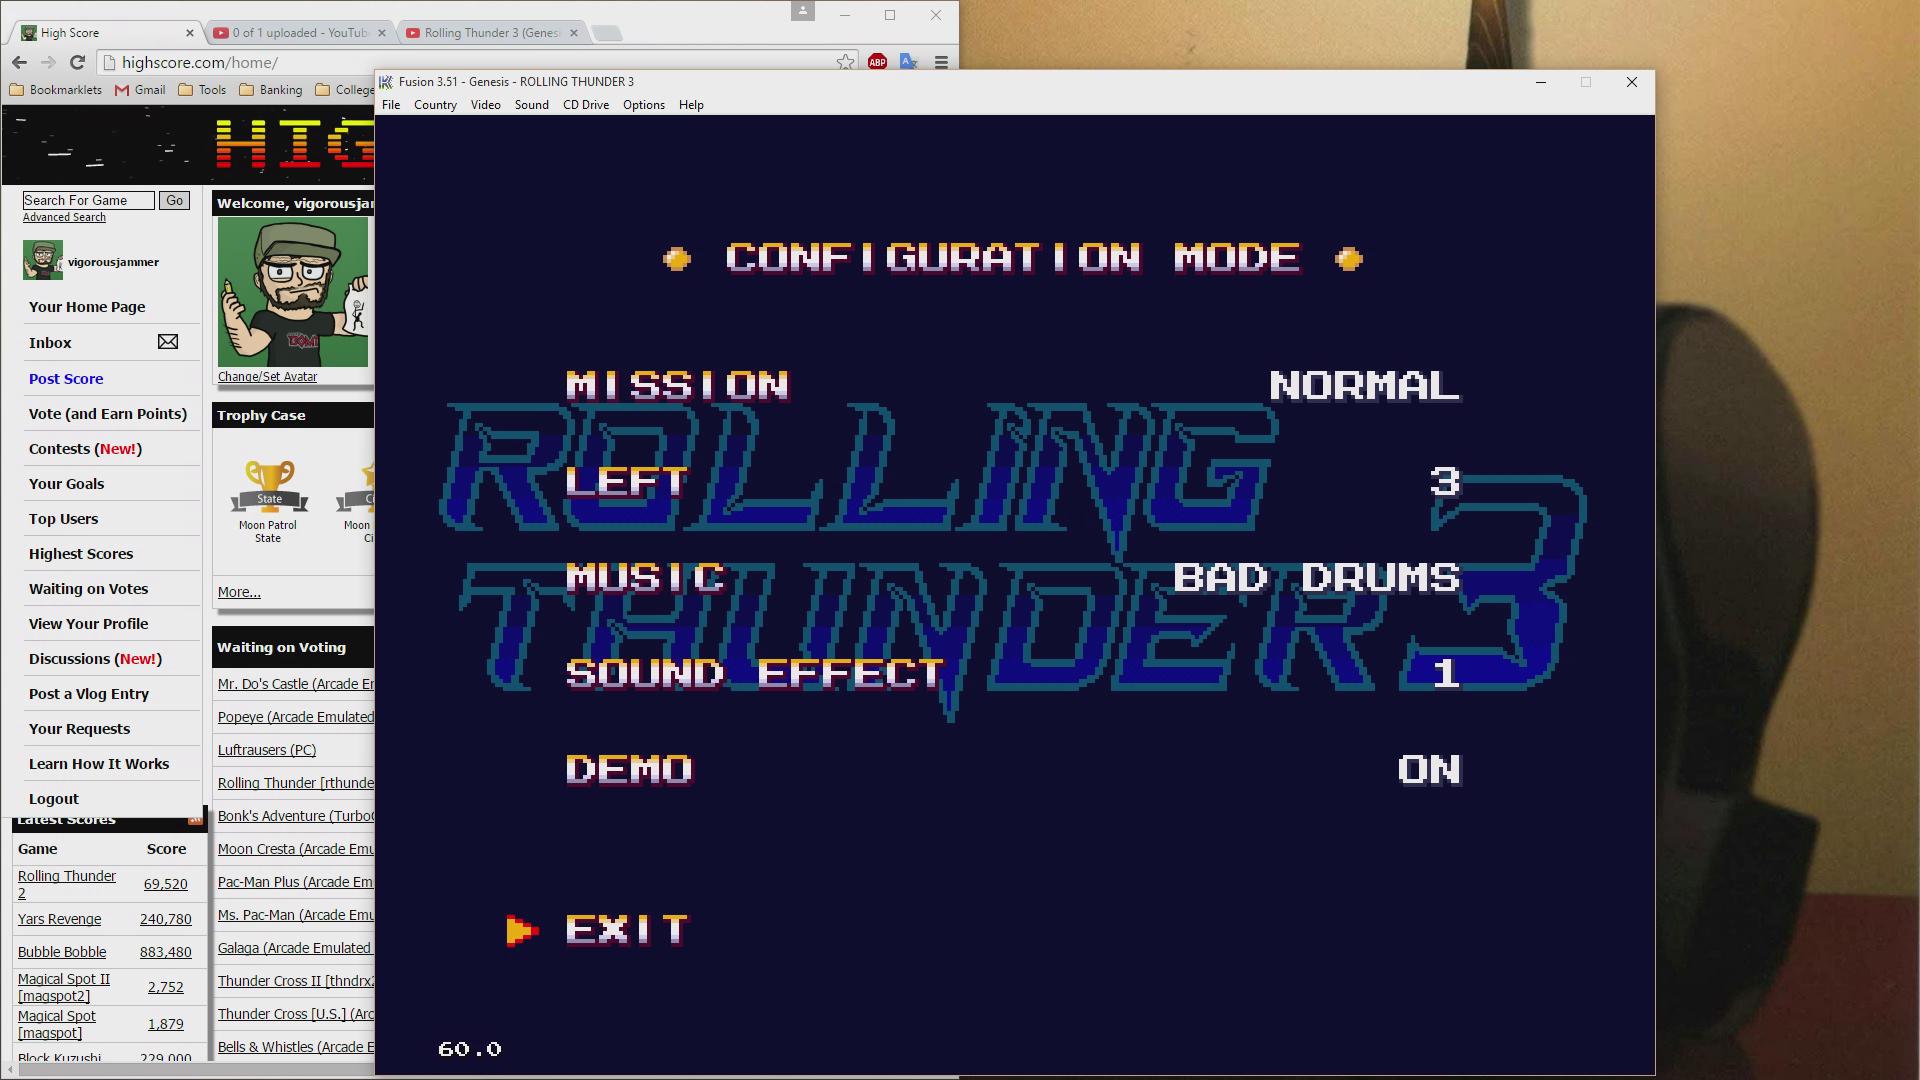 vigorousjammer: Rolling Thunder 3 (Sega Genesis / MegaDrive Emulated) 8,270 points on 2015-08-27 19:35:46